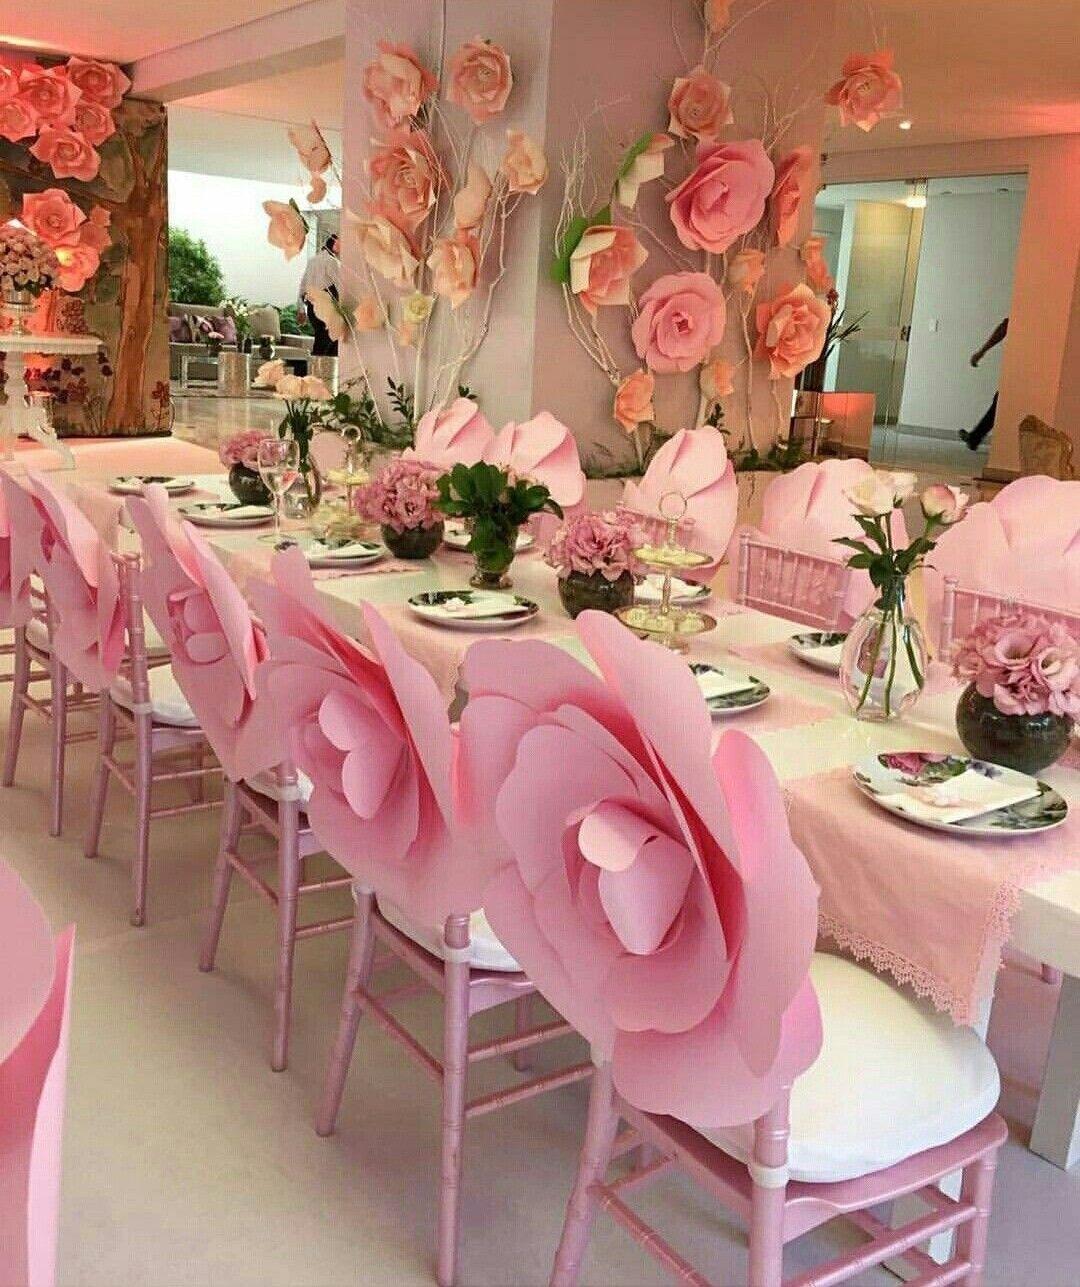 Sillas con flores decoracion de fiestas pinterest - Papeles de decoracion ...